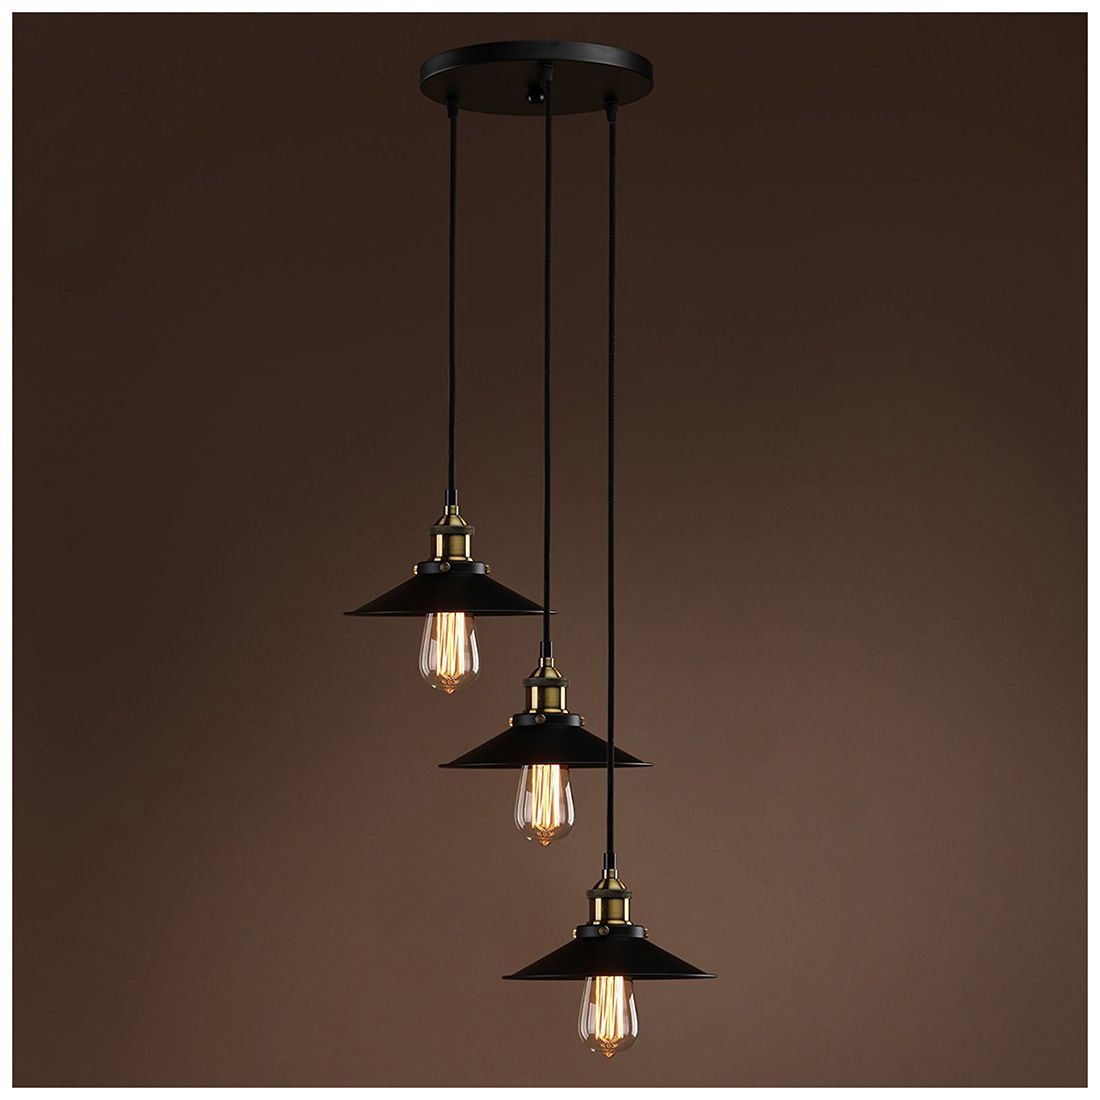 Retractable Hanging Light Vintage Loft Industrial Pendant Lights Adjustable Wire Lamps (diameter 22cm cable length 1.5m) цена 2017